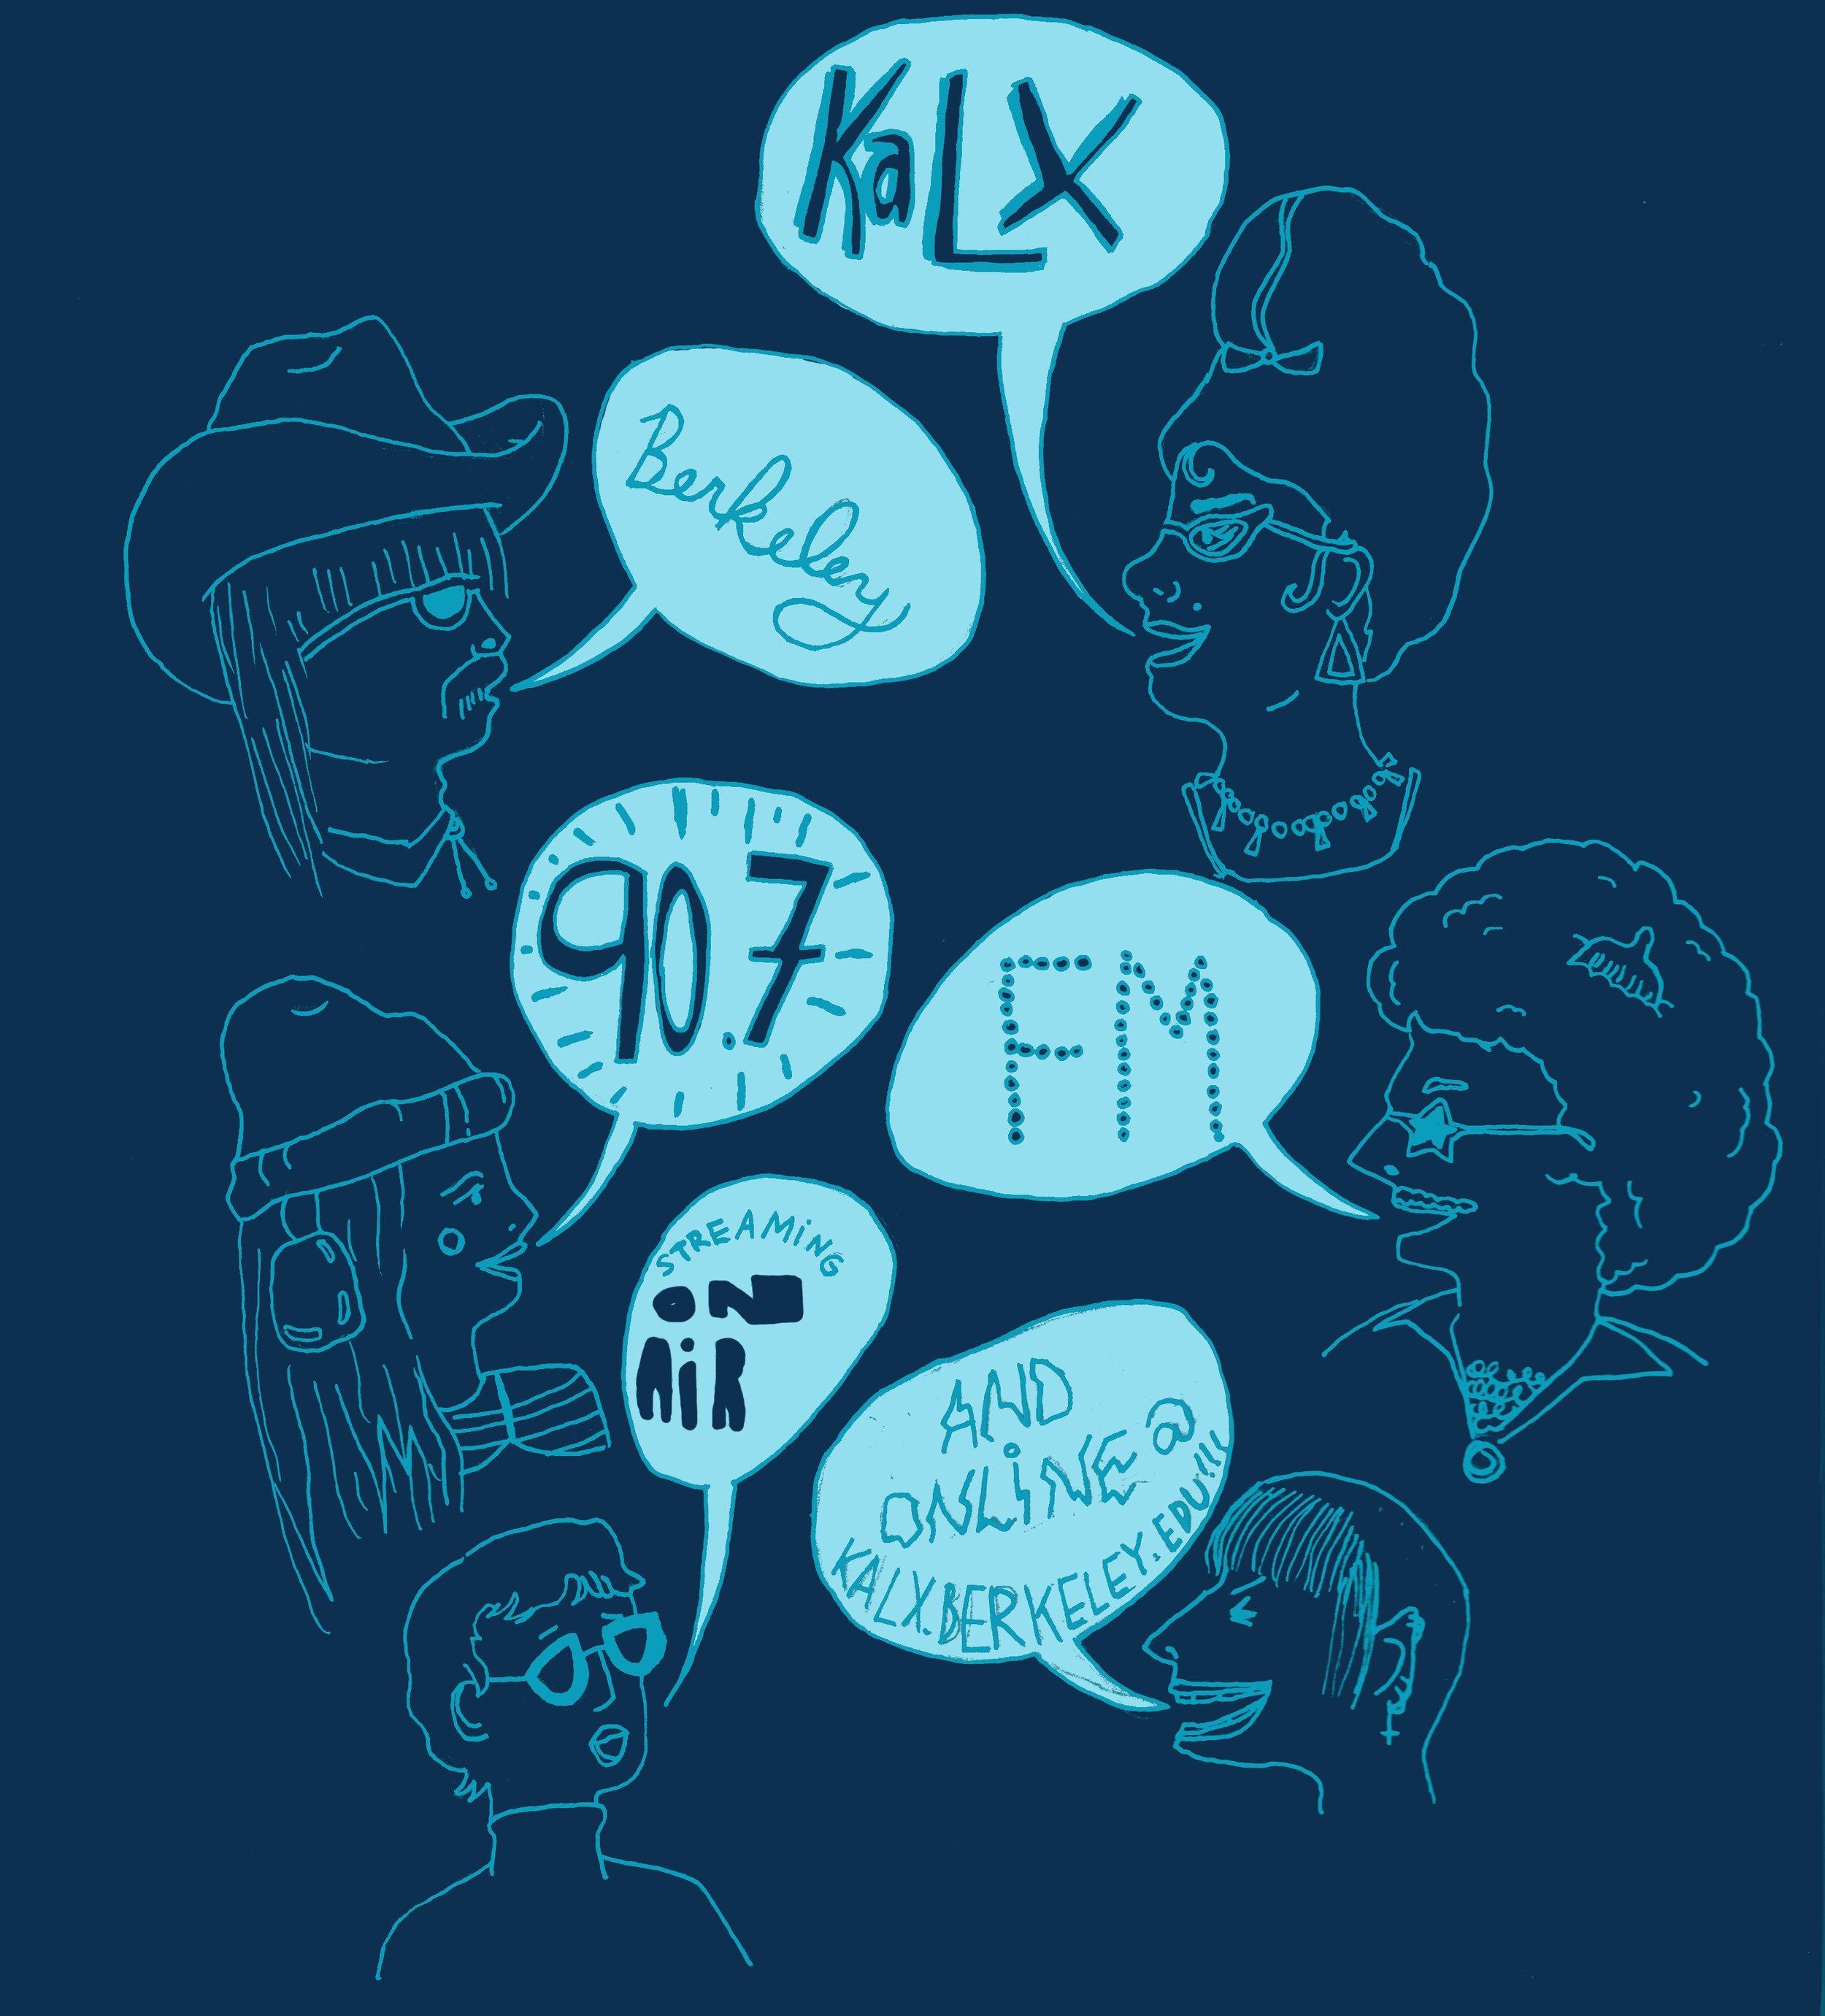 KALX Radio Station t-shirt design. 2015.